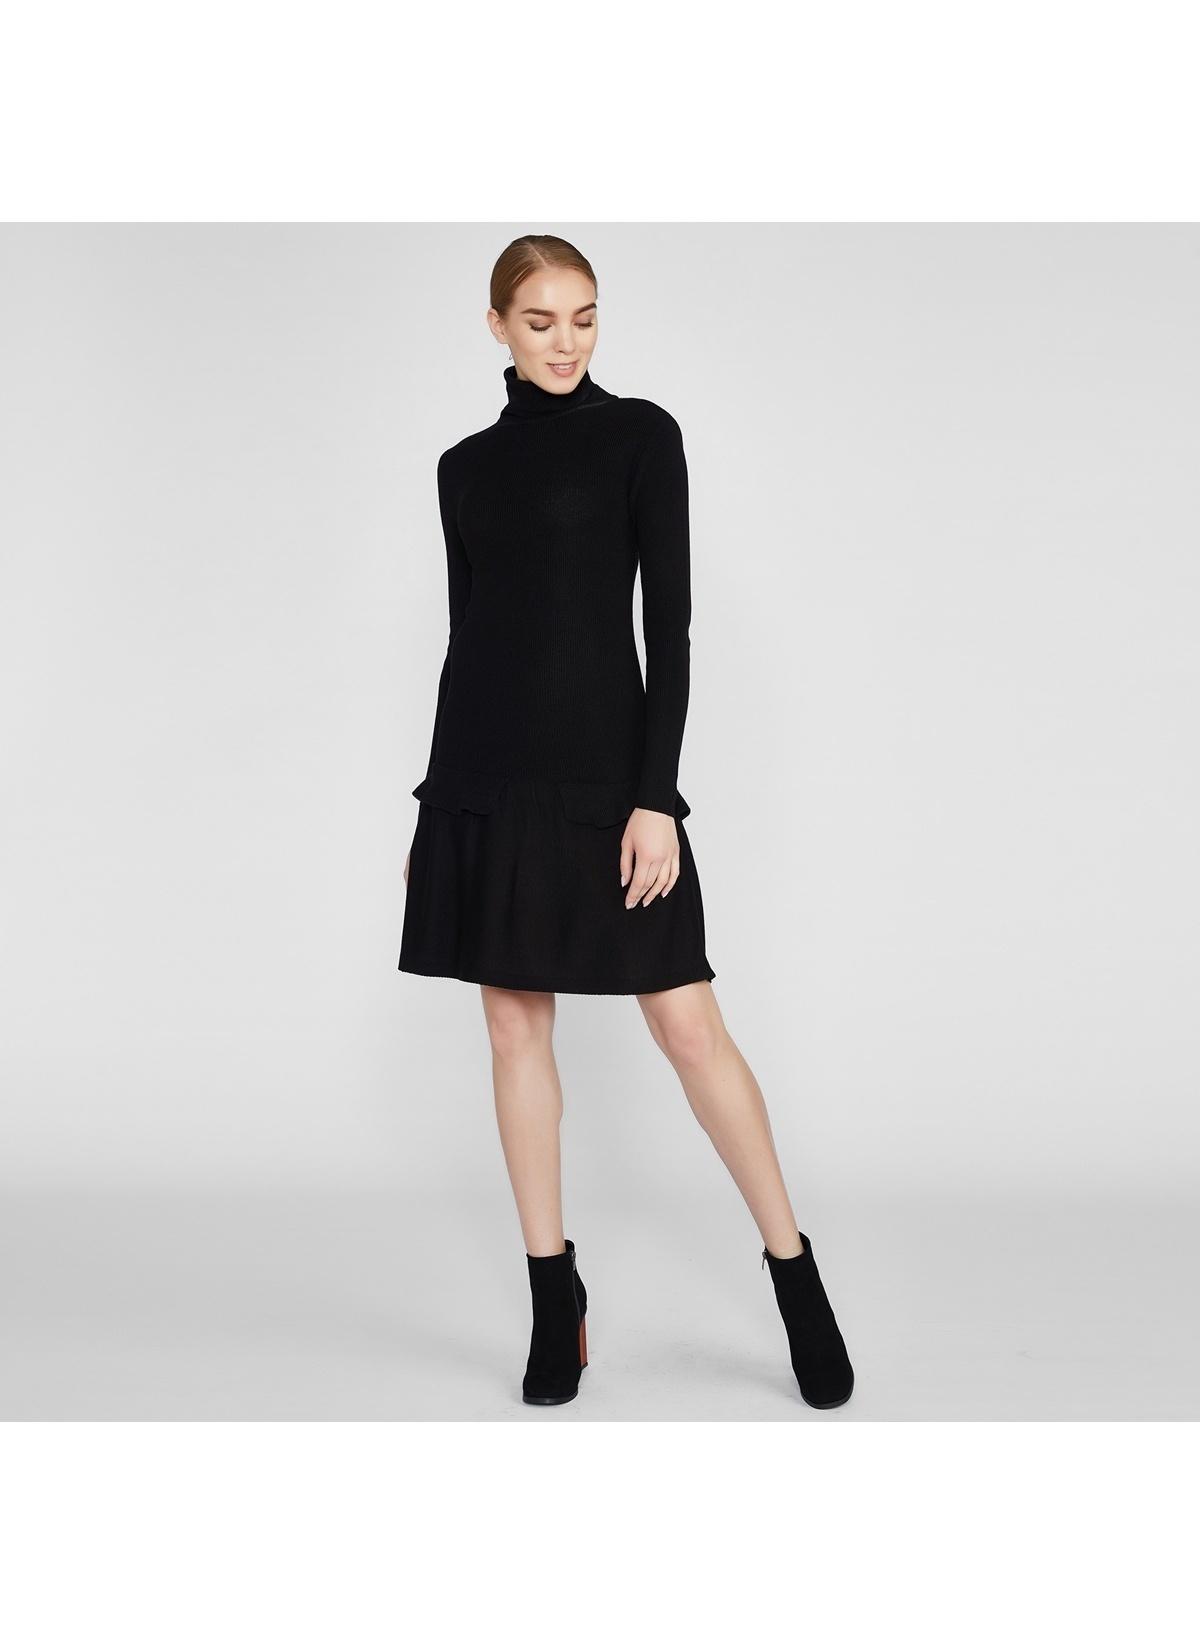 103debbfc5c4d Vekem-Limited Edition Kadın Dik Yaka Triko Elbise Siyah   Morhipo ...